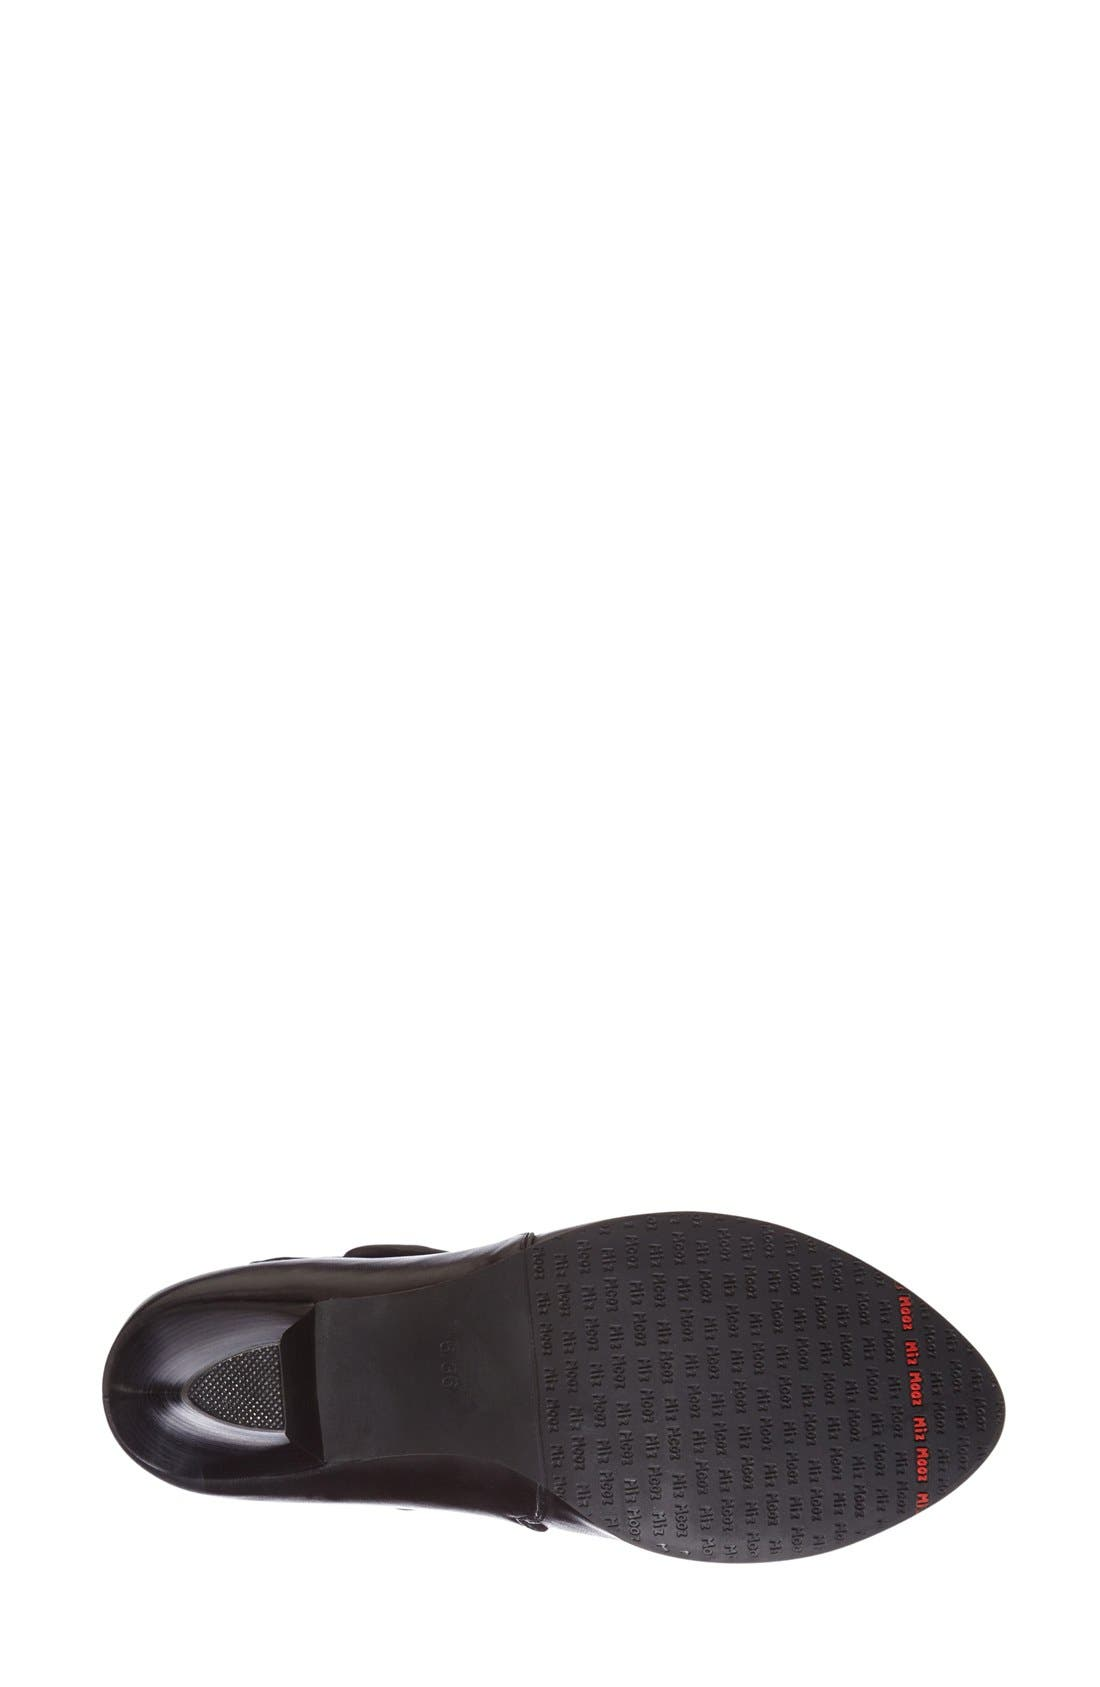 Alternate Image 4  - Miz Mooz Footwear 'Carissa' Mary Jane Pump (Women)